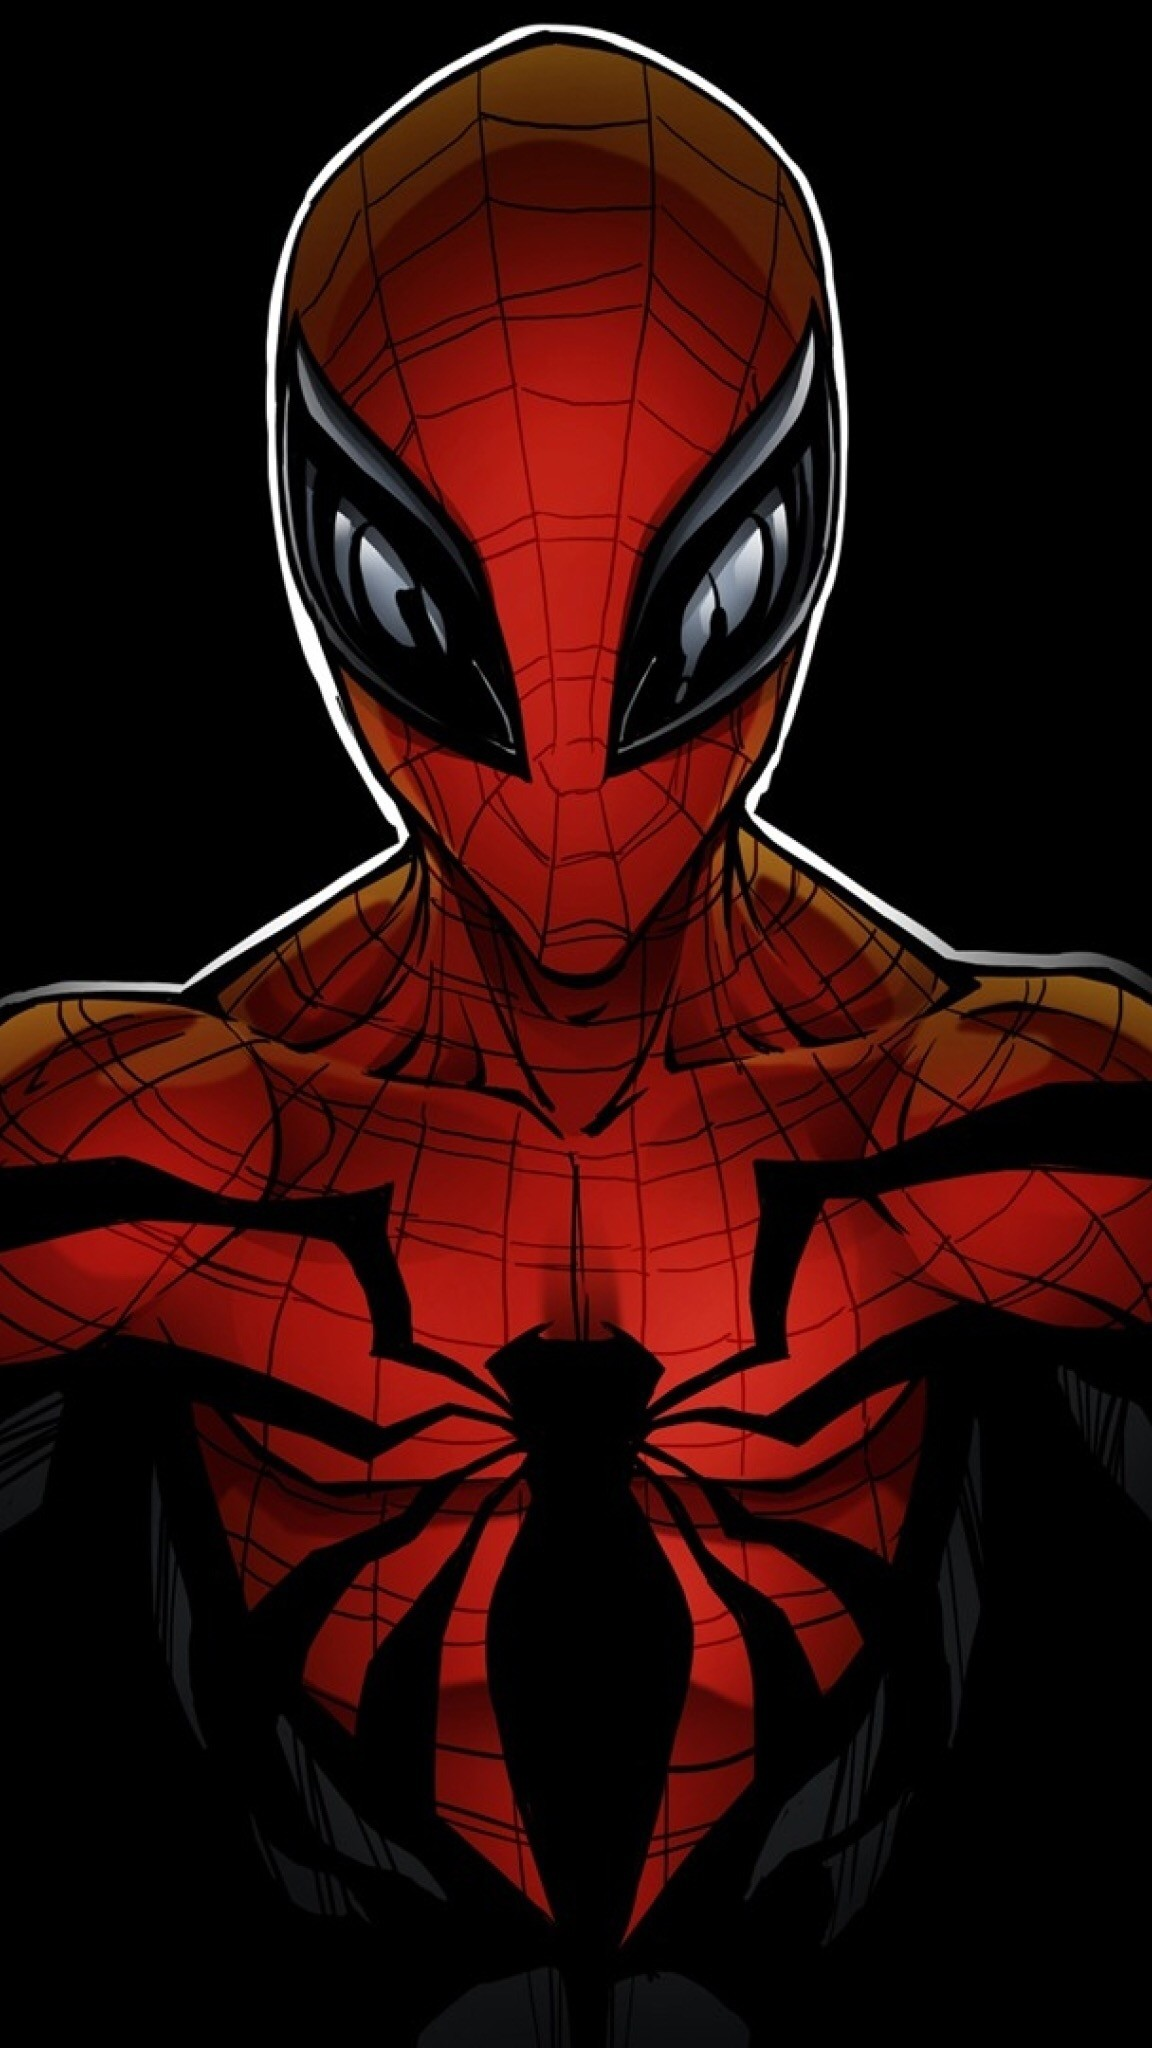 Black Backgrounds, Wallpaper Backgrounds, Spiderman Art, Spider Verse, Spider  Man, Stan Lee, Color Pictures, Deadpool, Spin